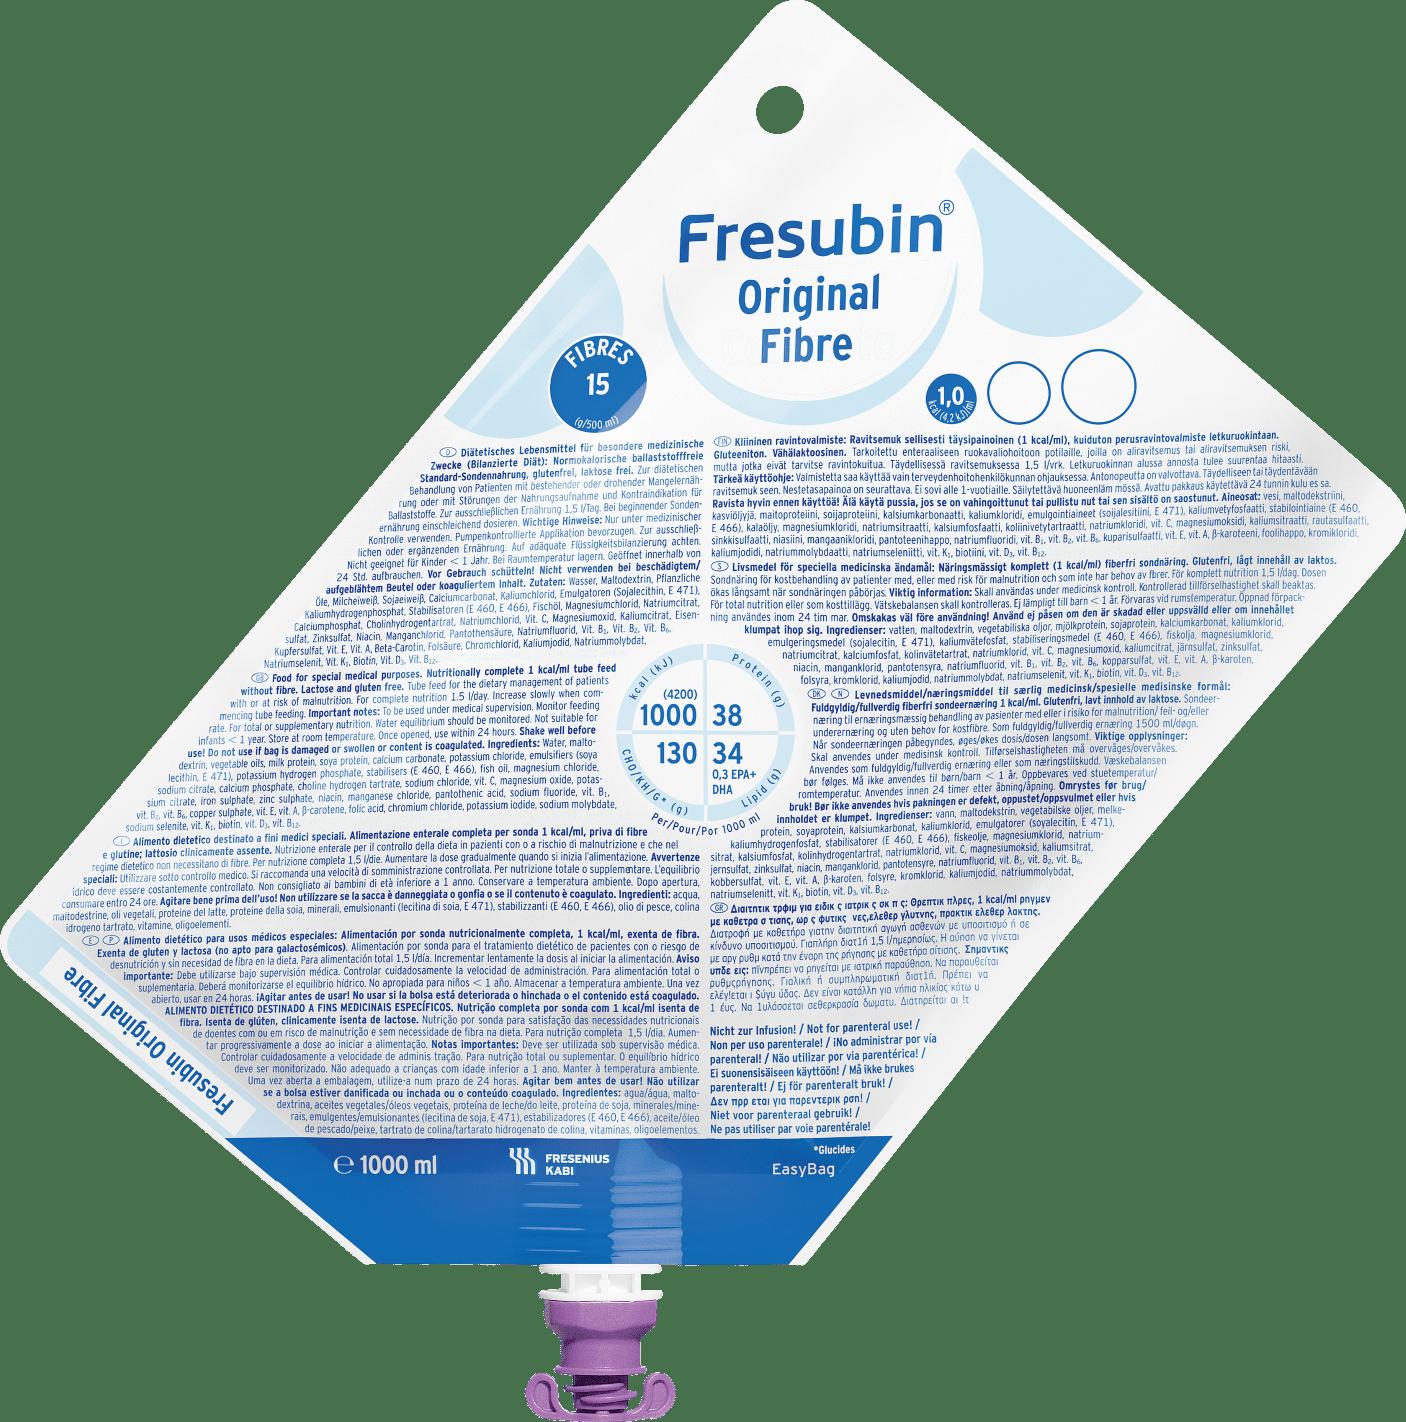 Fresubin_Original_Fibre_Int_1000ml2